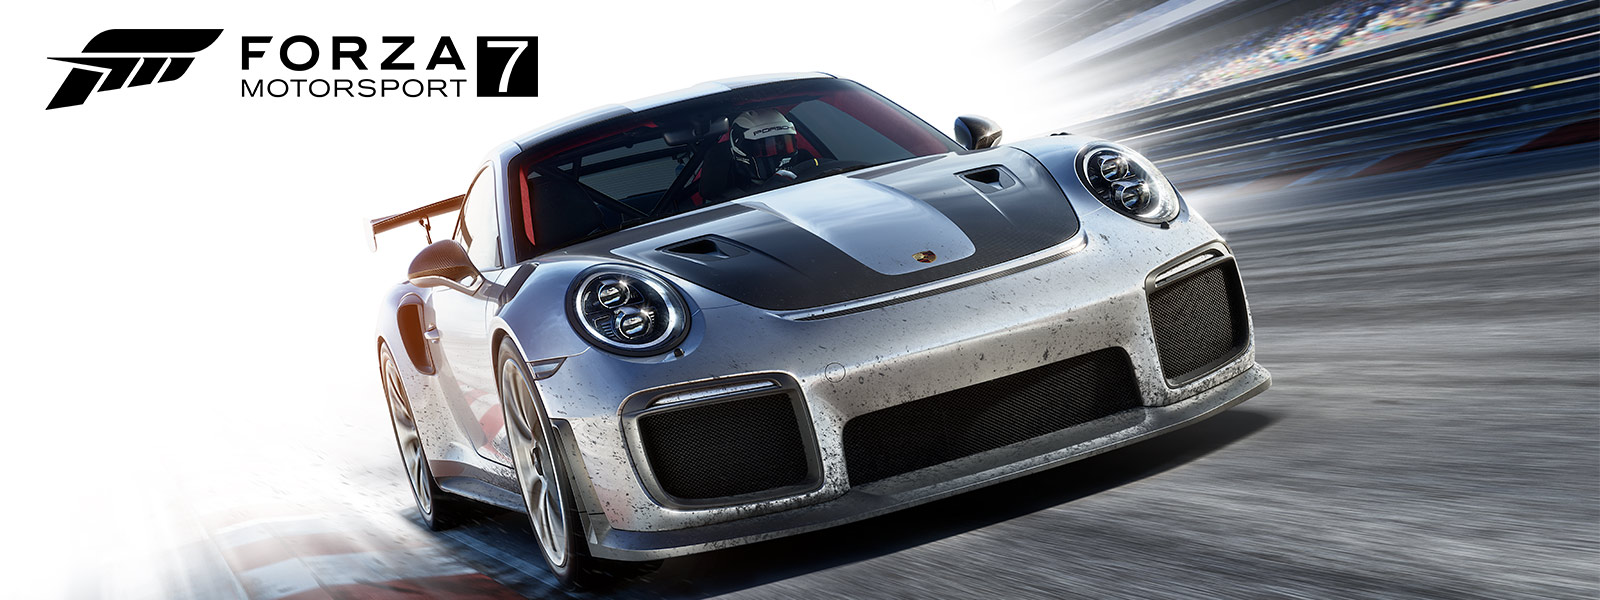 Forza Motorsport 7 遊戲畫面